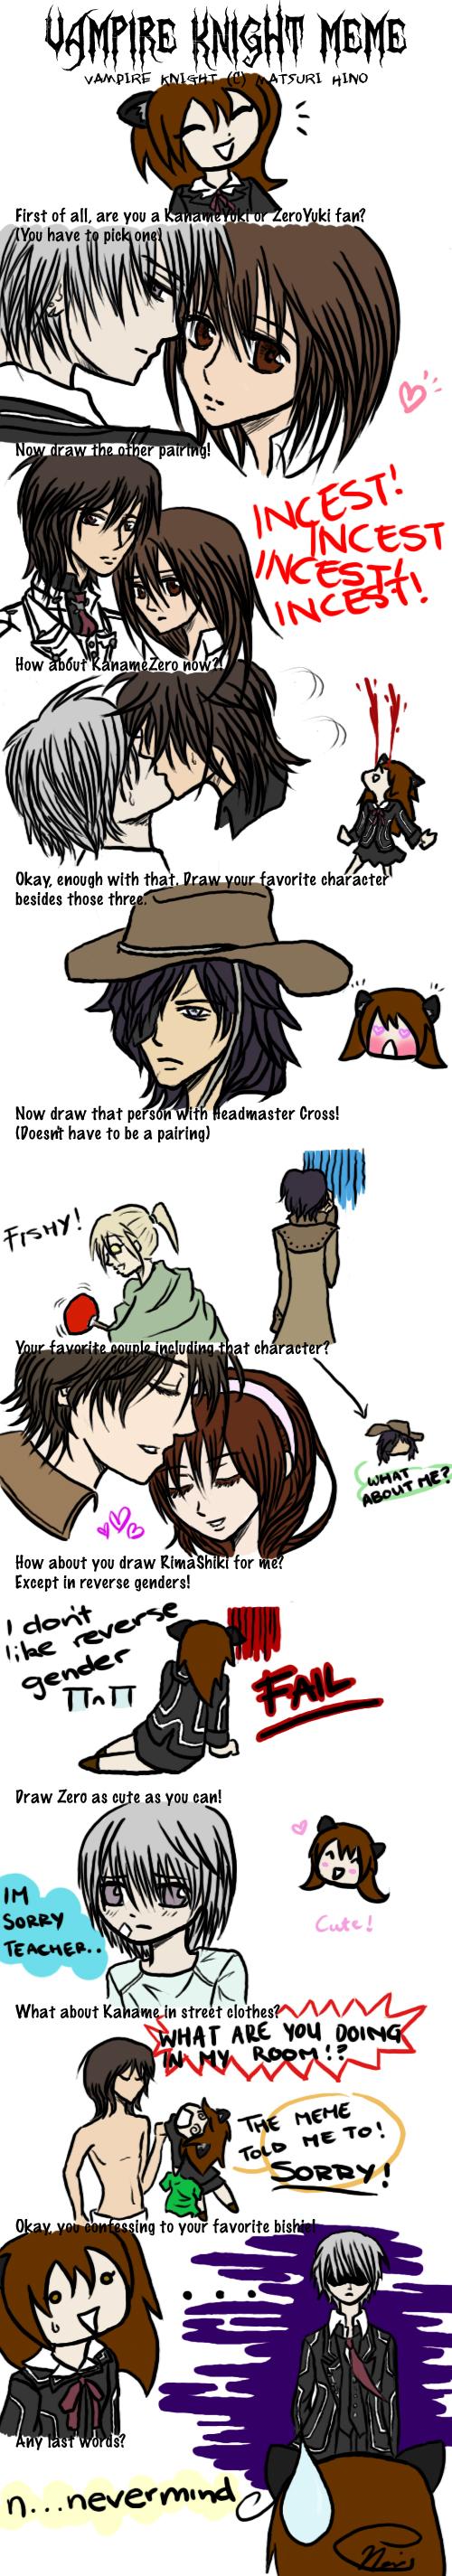 Vampire Knight Meme By Hahwhatever On Deviantart